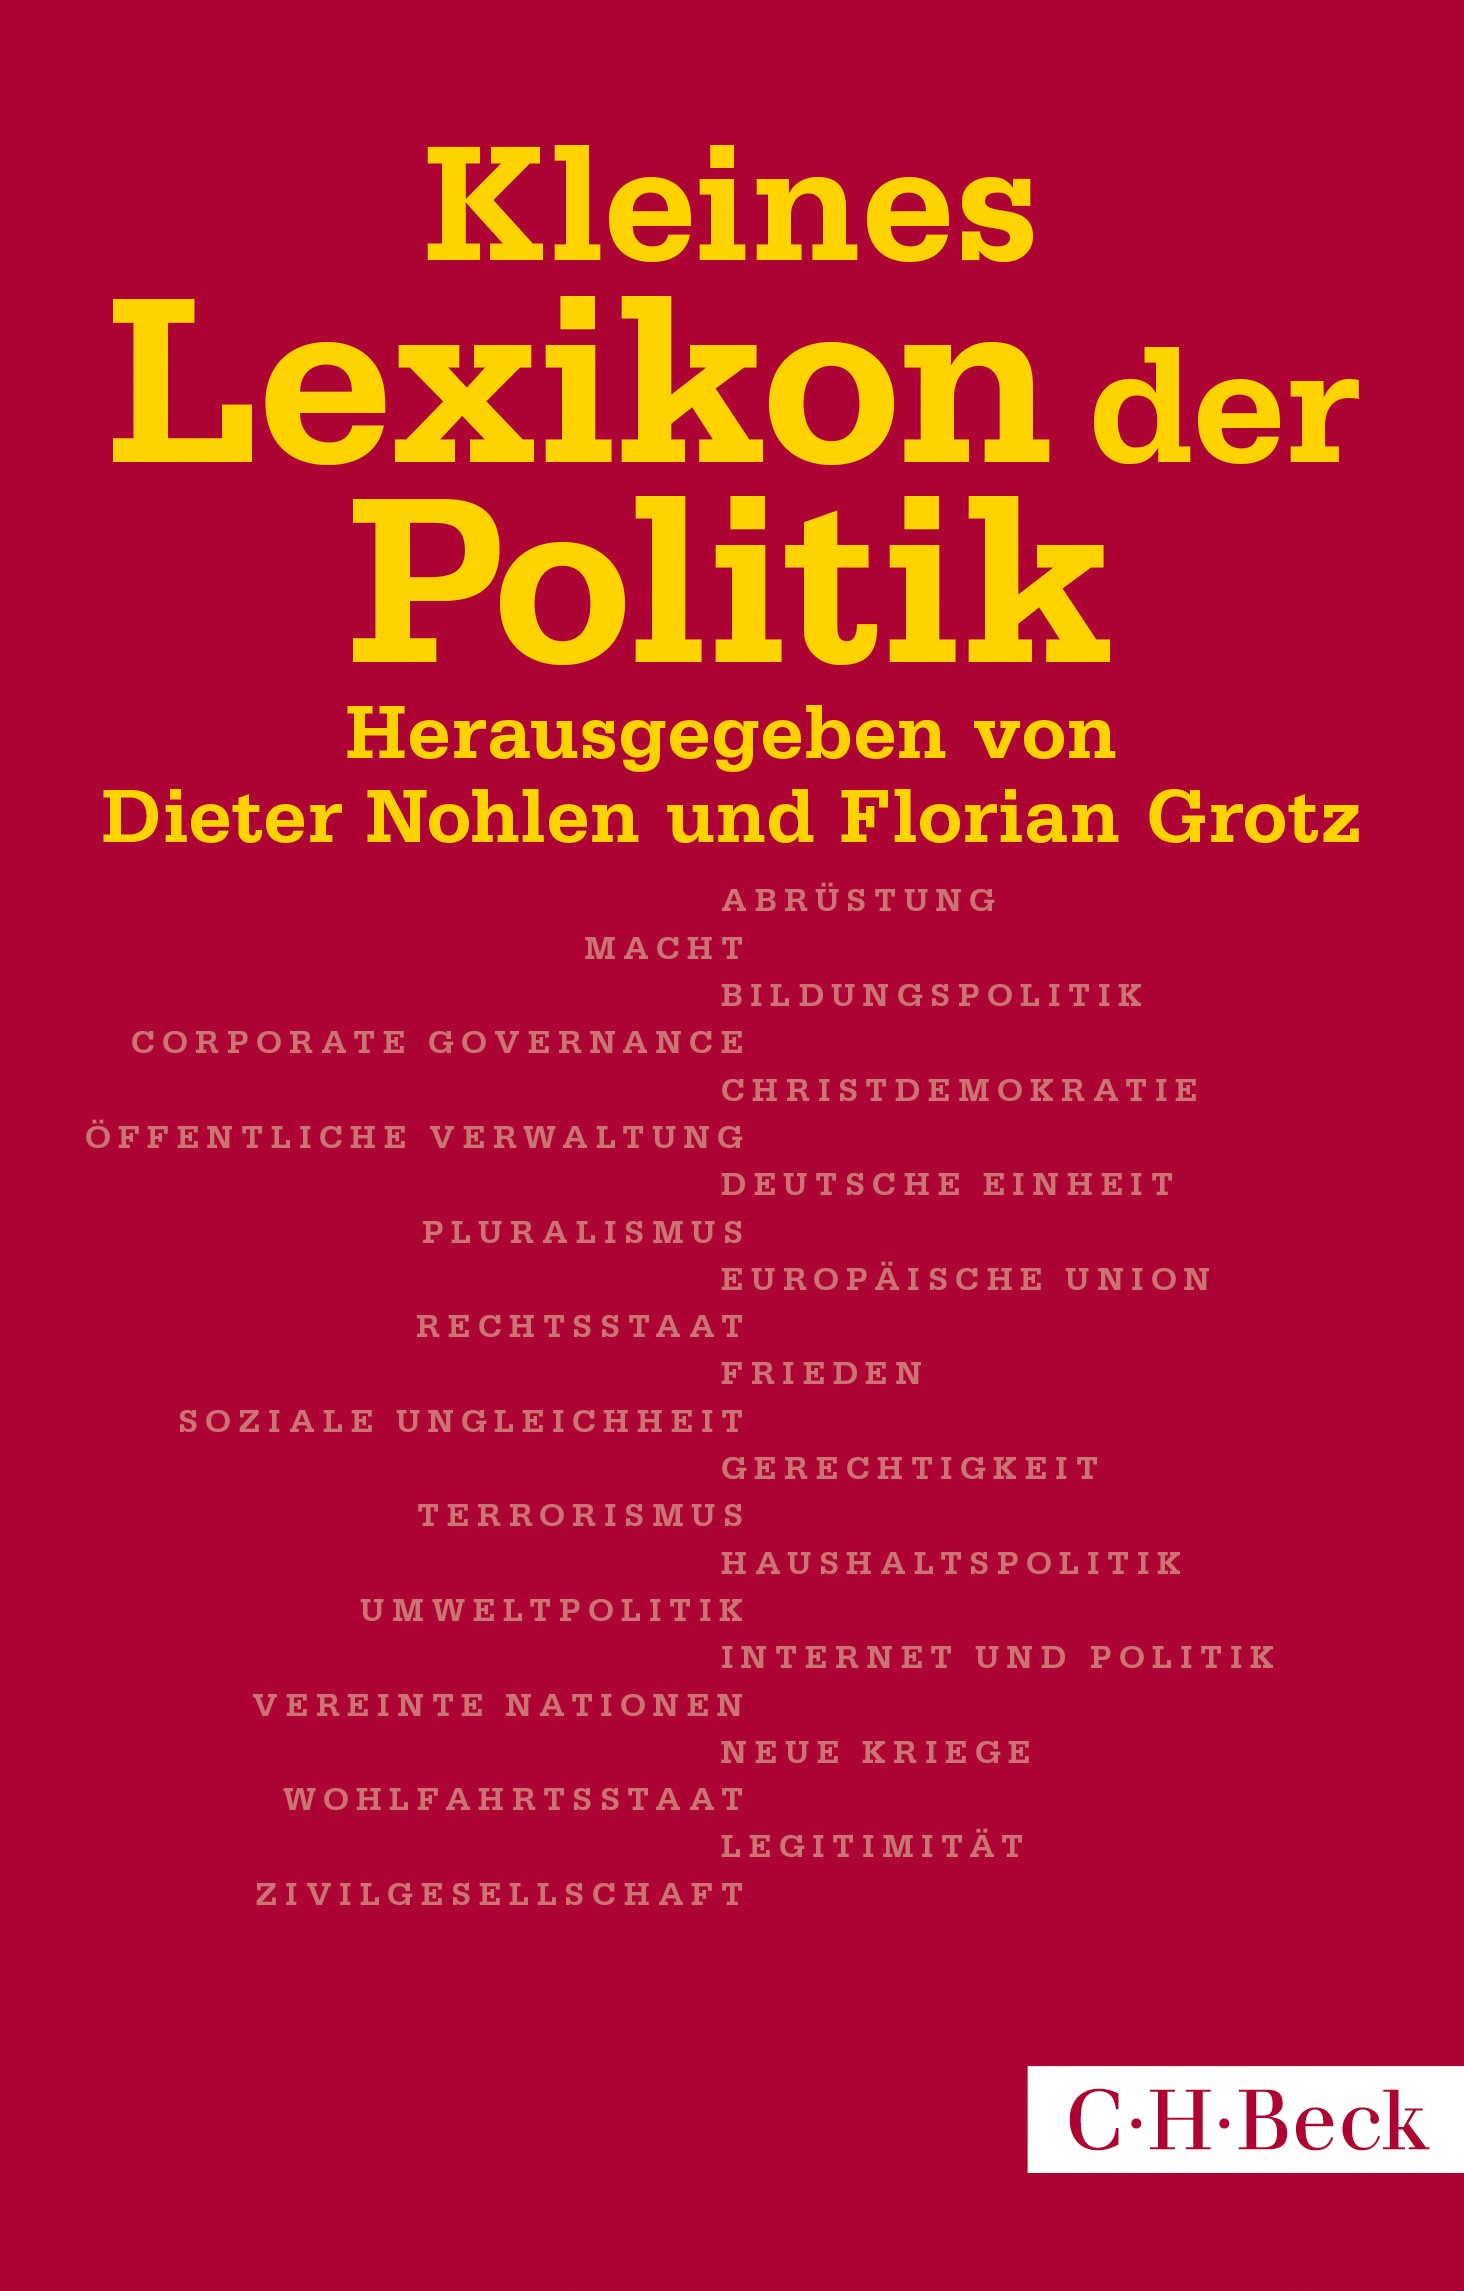 Cover des Buches 'Kleines Lexikon der Politik'